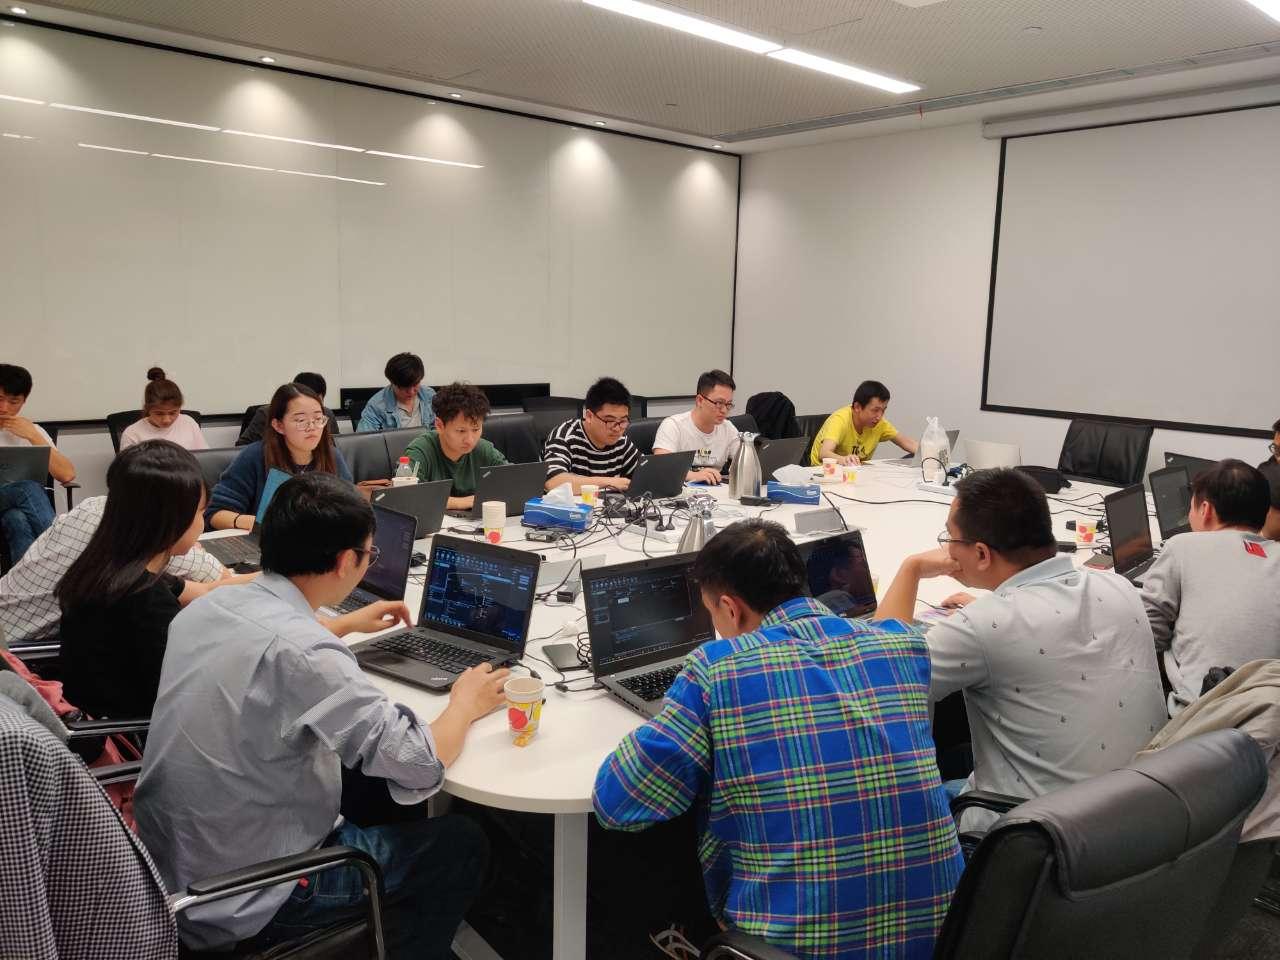 iS-RPA 技术认证培训 上海 201901025 班